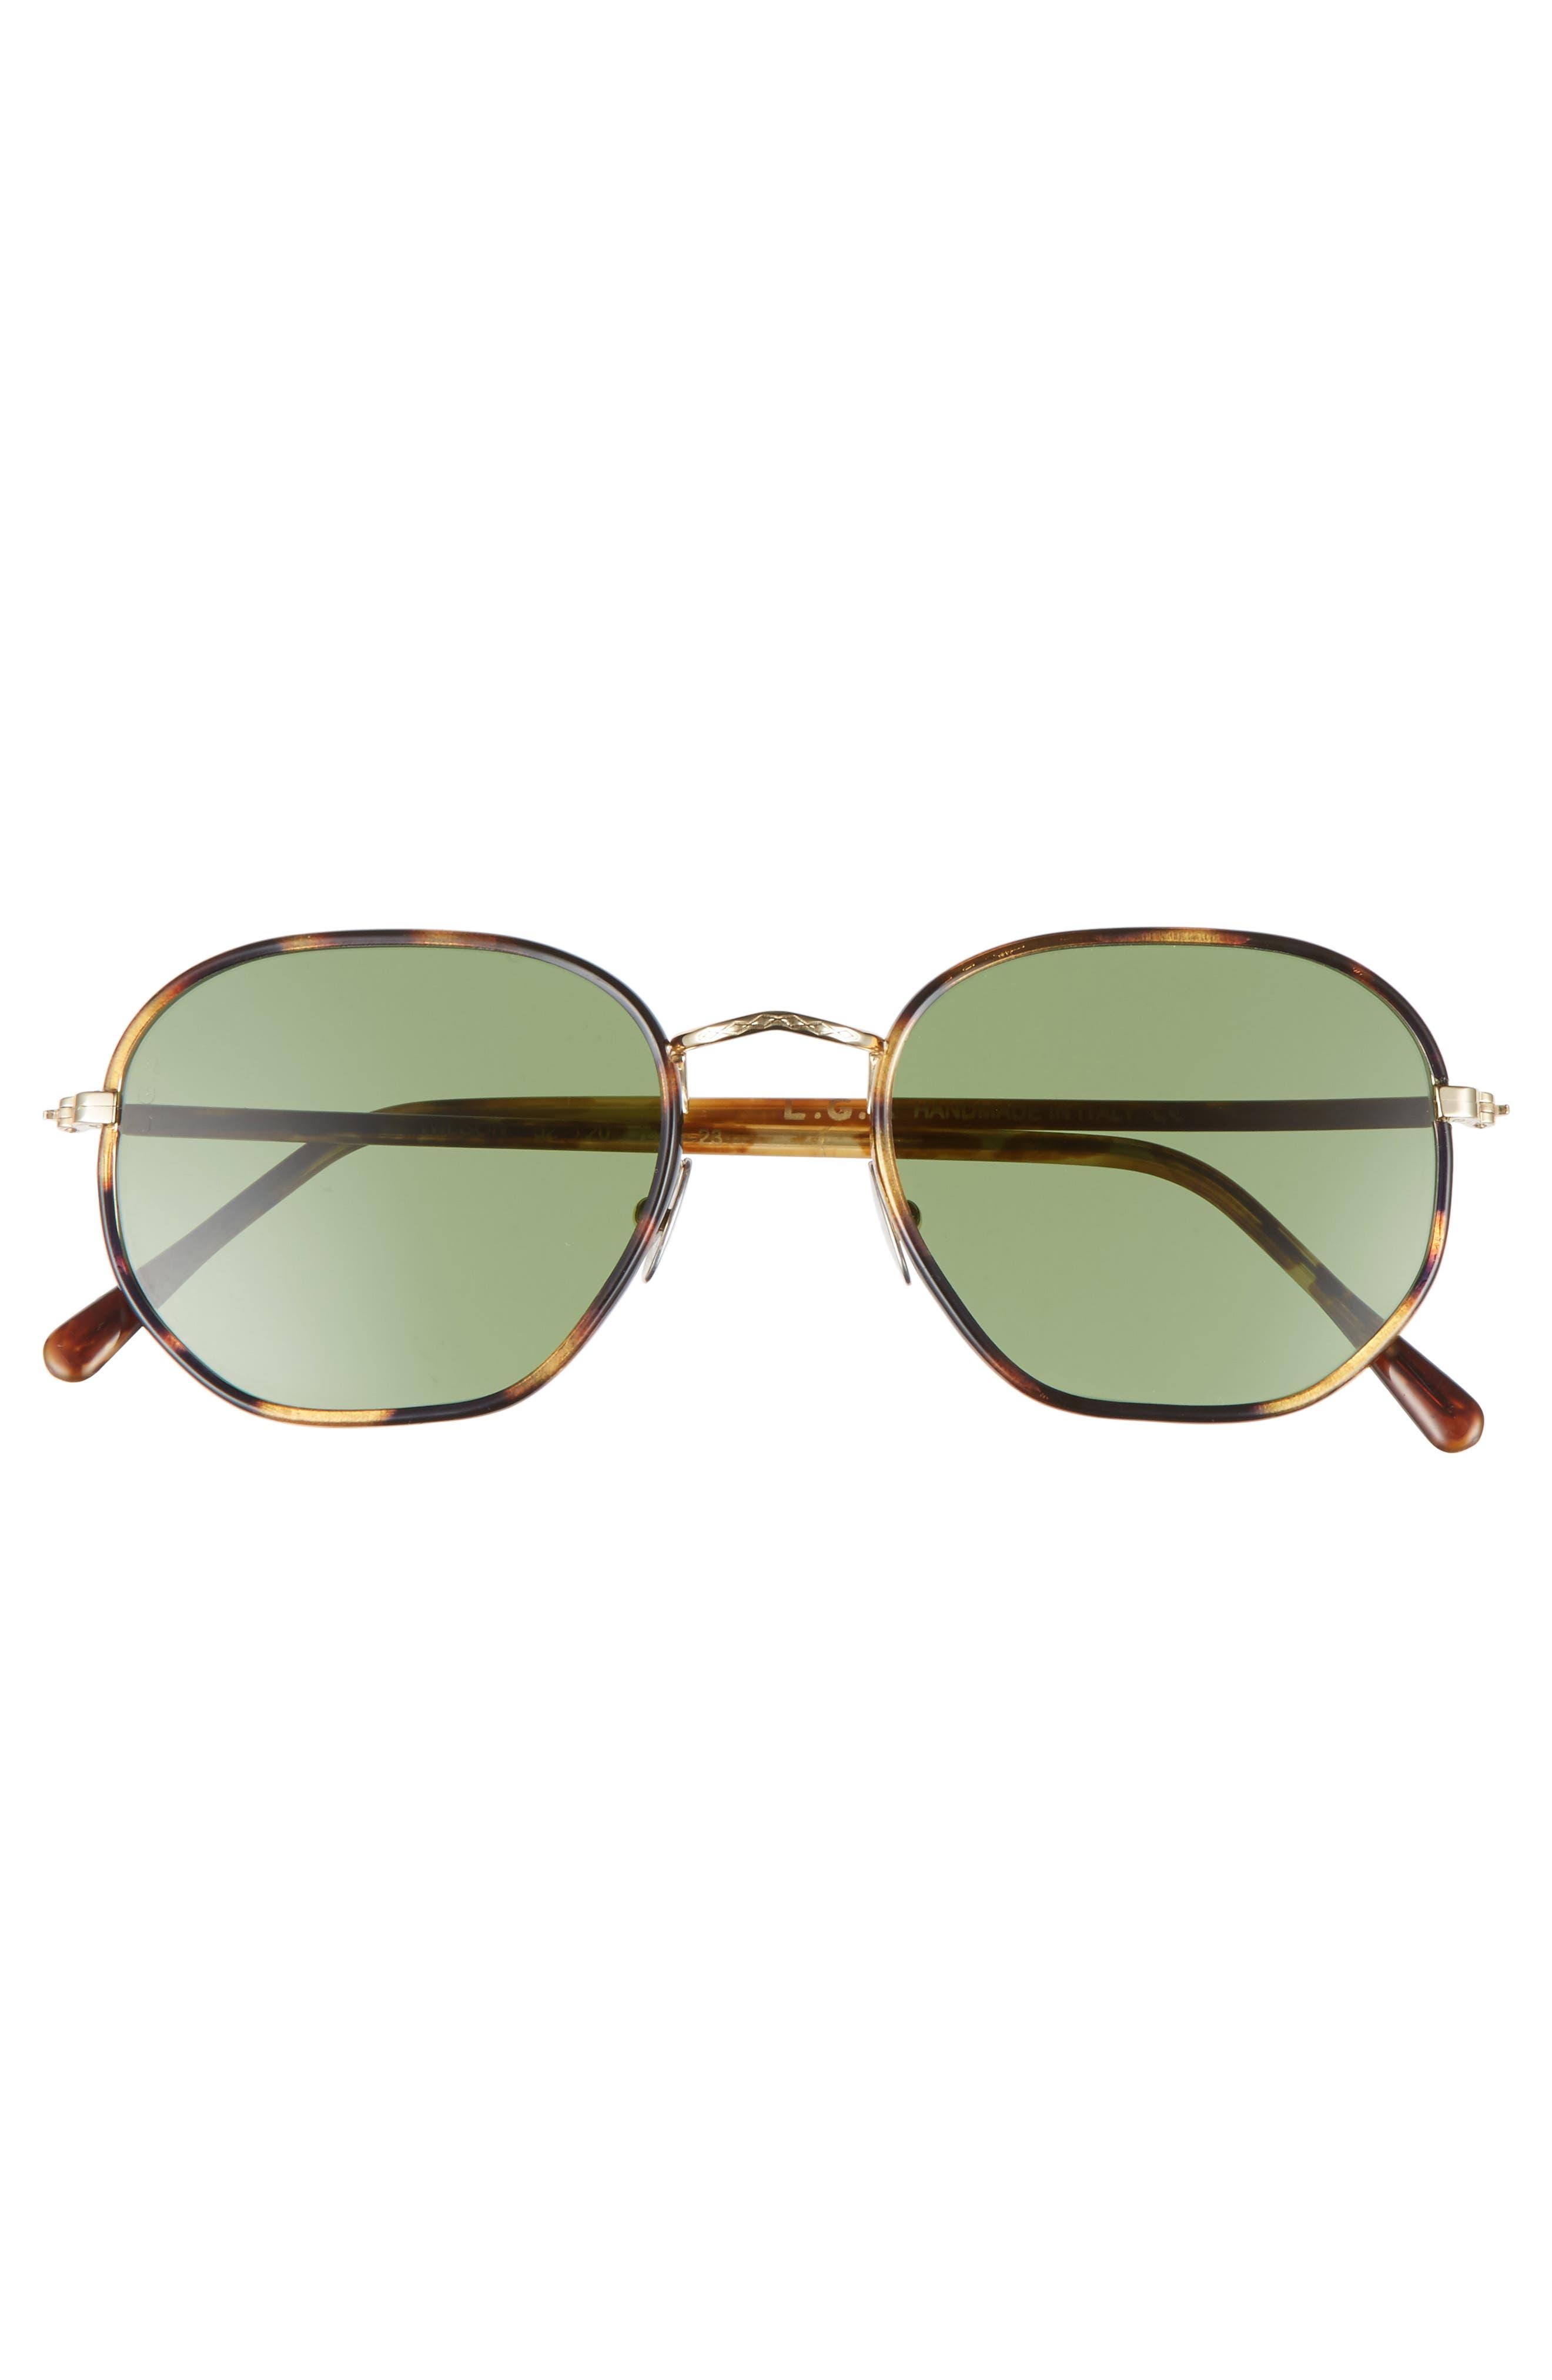 Wilson 52mm Sunglasses,                             Alternate thumbnail 2, color,                             Havana Tartarugato/ Green